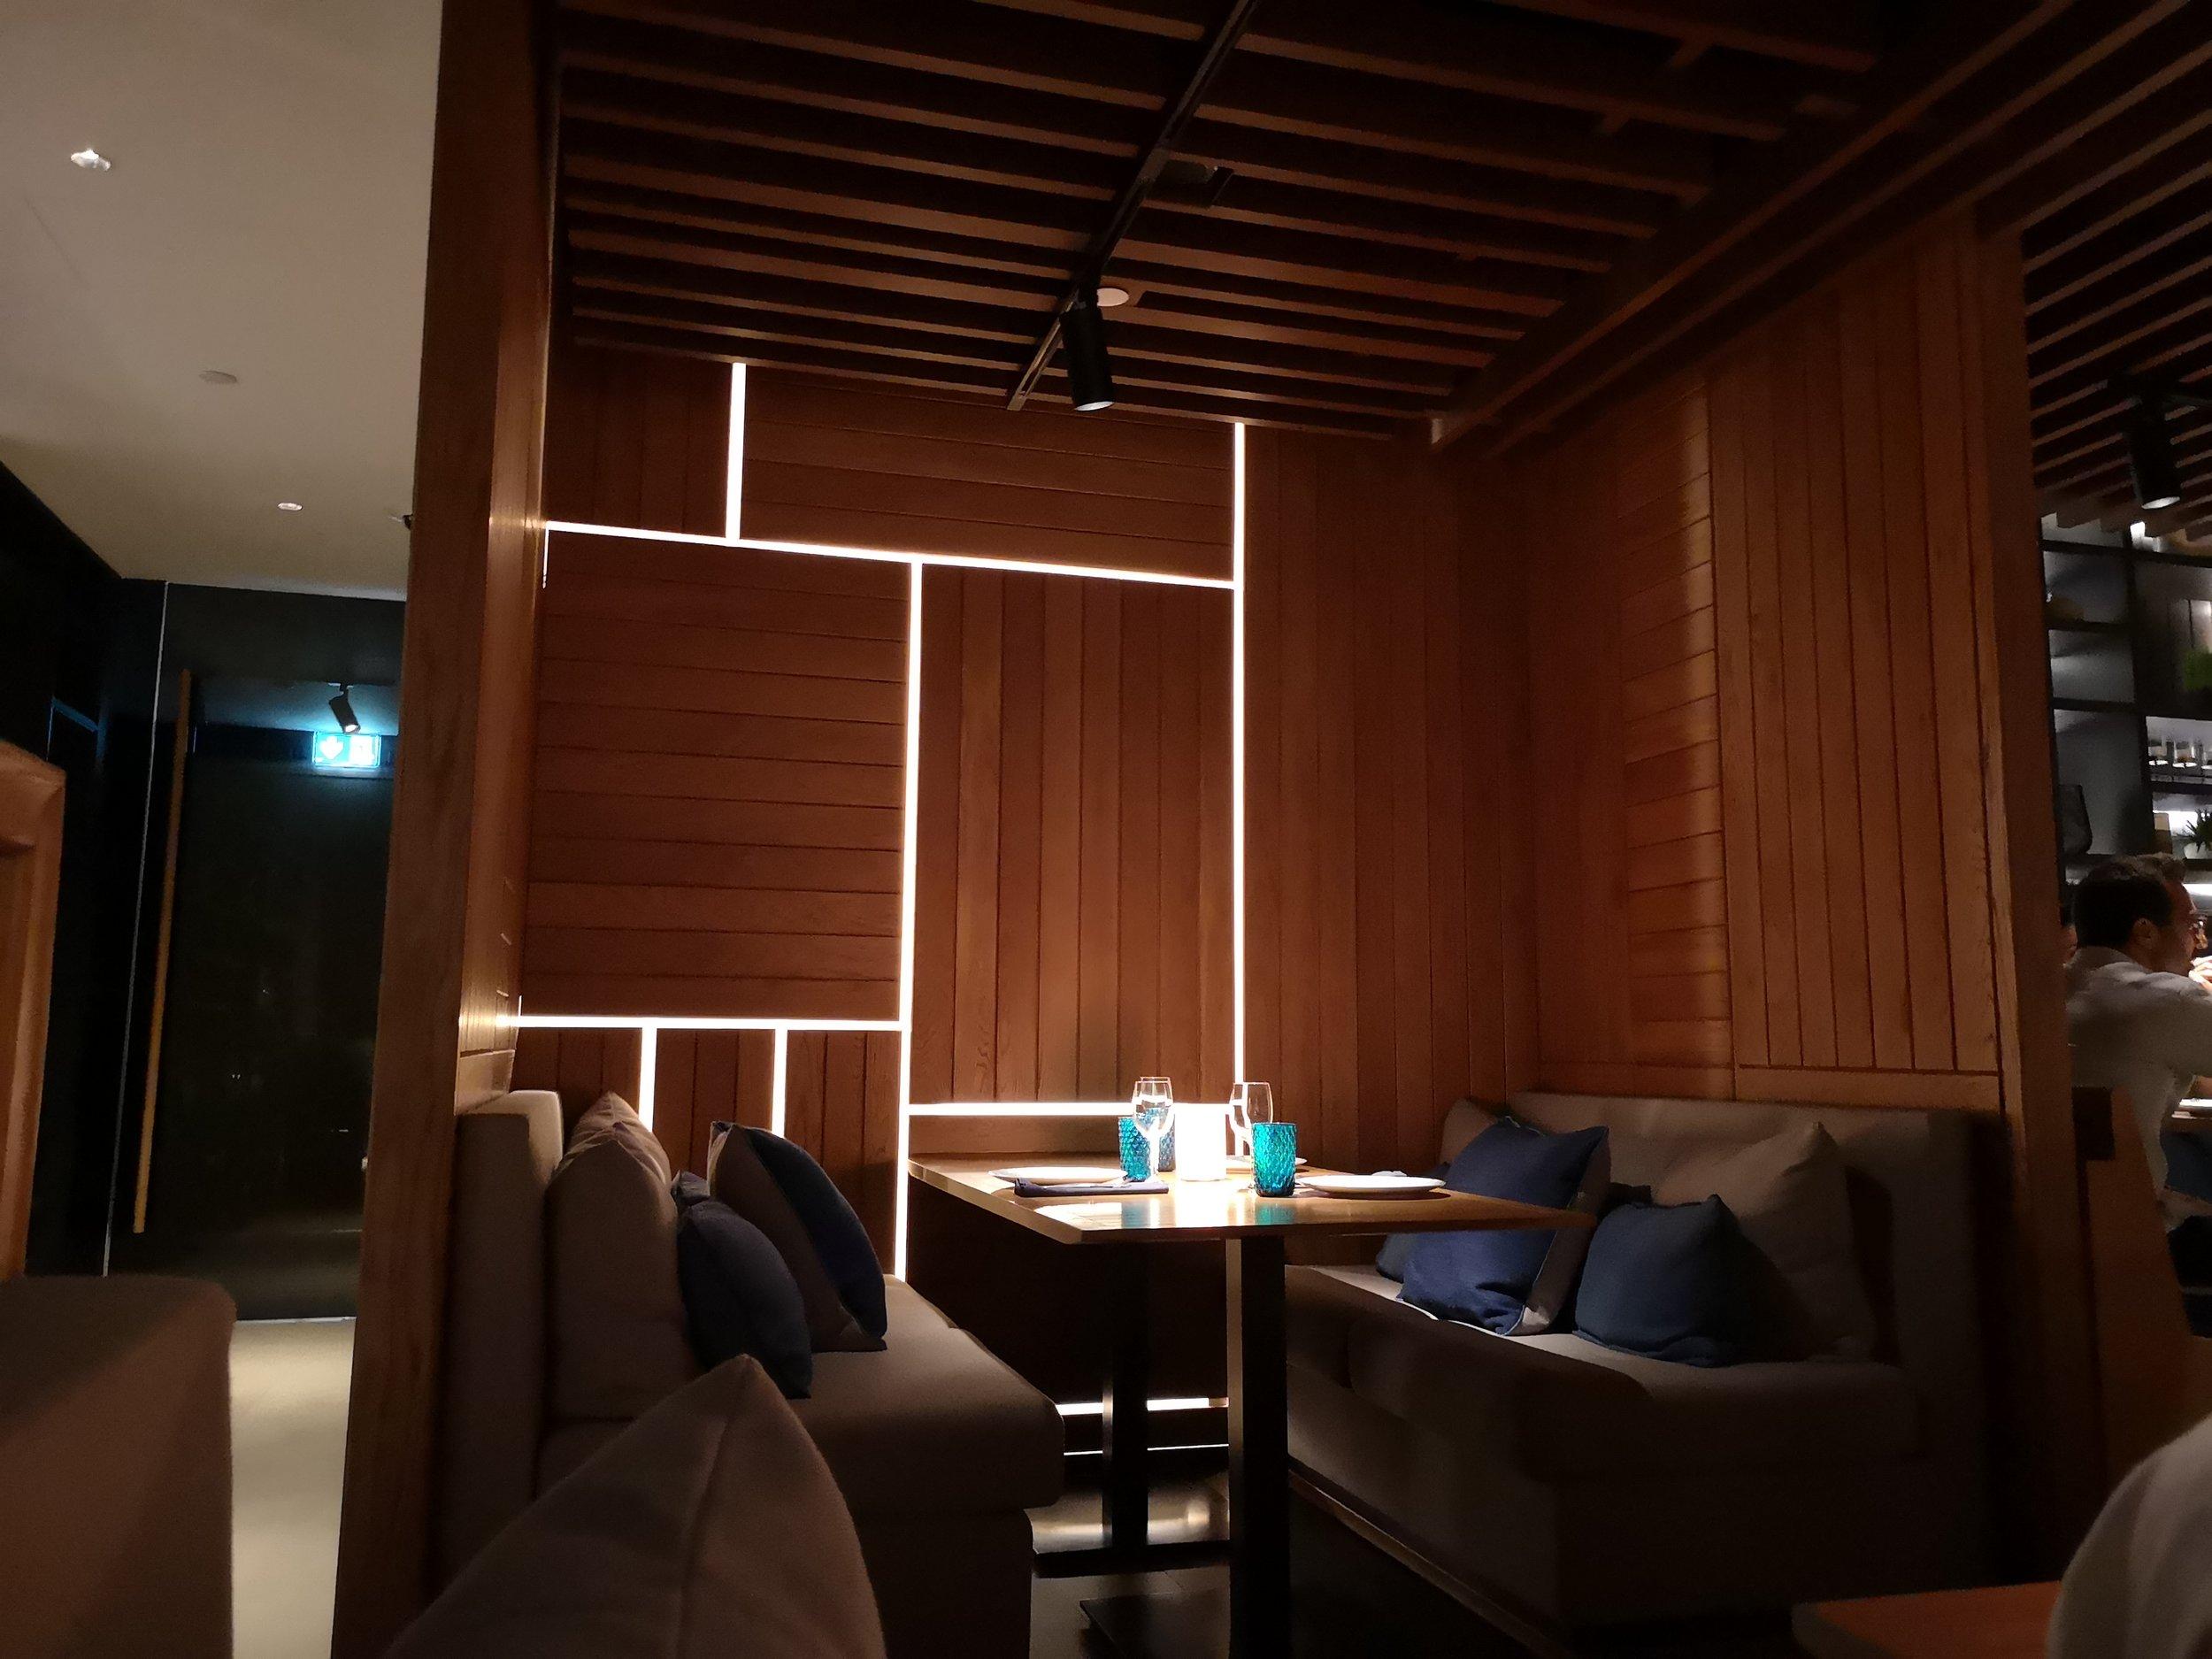 Sitting Arrangements Tasca Mandarin Oriental | Comfy!